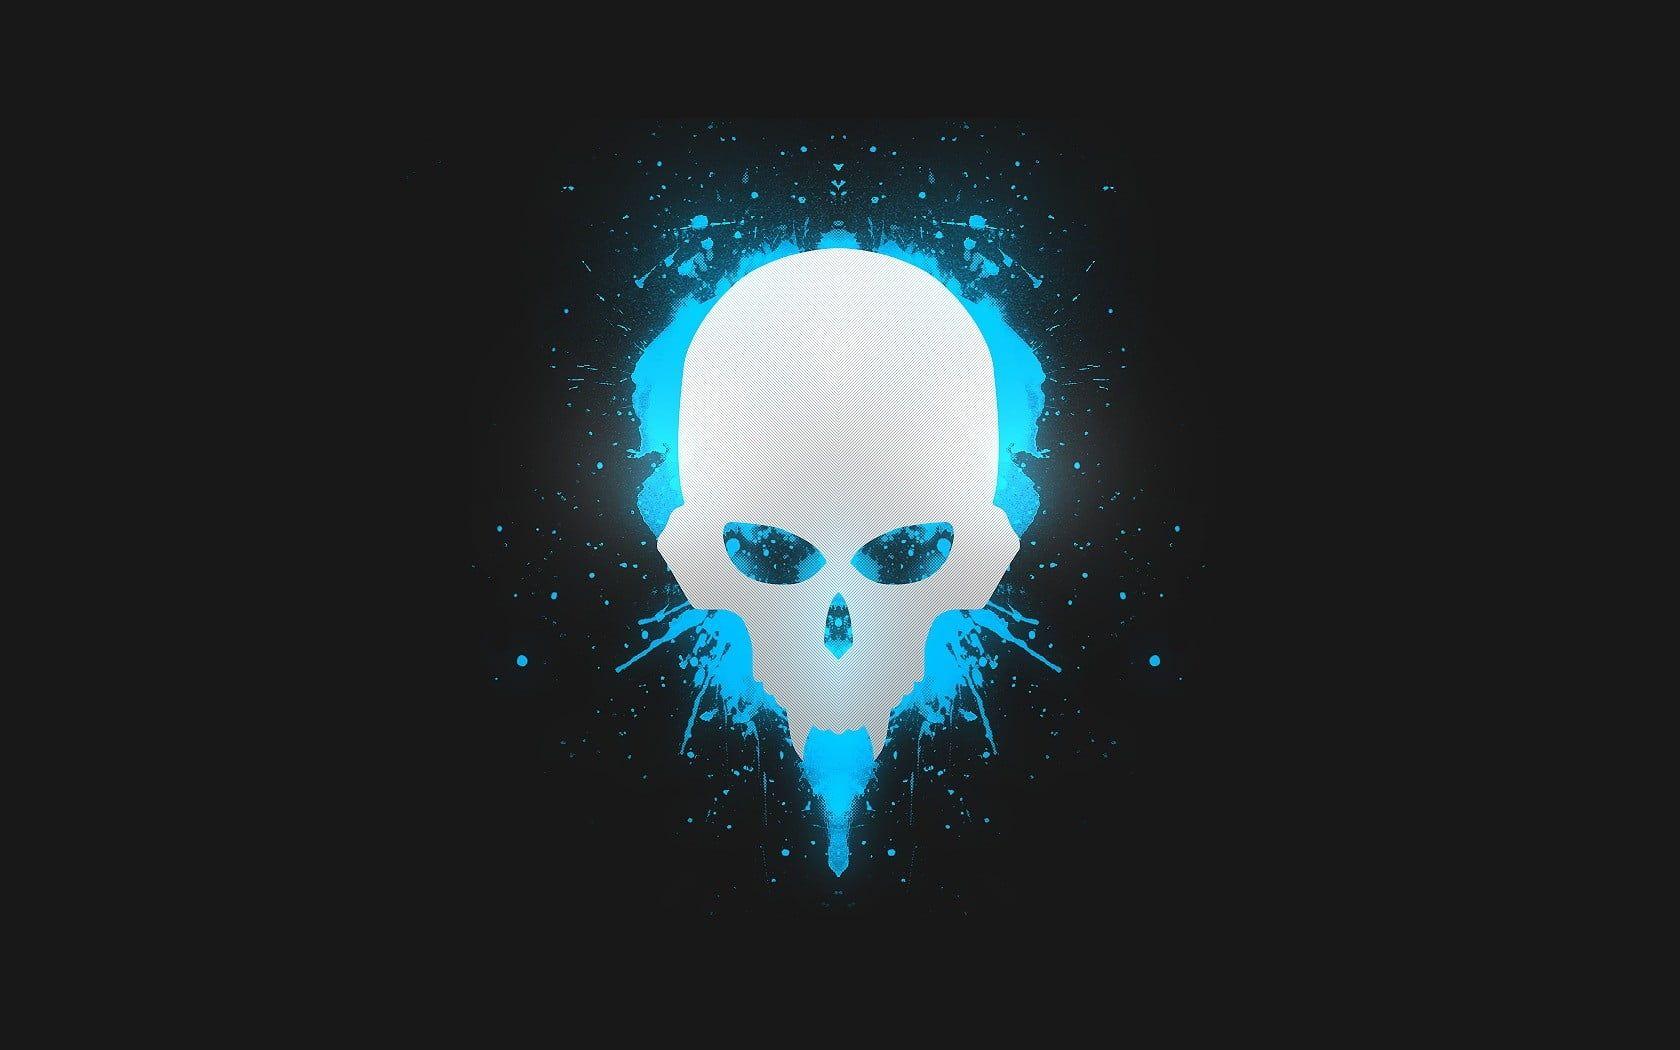 White Skull Illustration Skull Minimalism Pgc Gray Digital Art Cyan Simple Black Simple Background 720p Wallpap Skull Illustration Art Skull Wallpaper